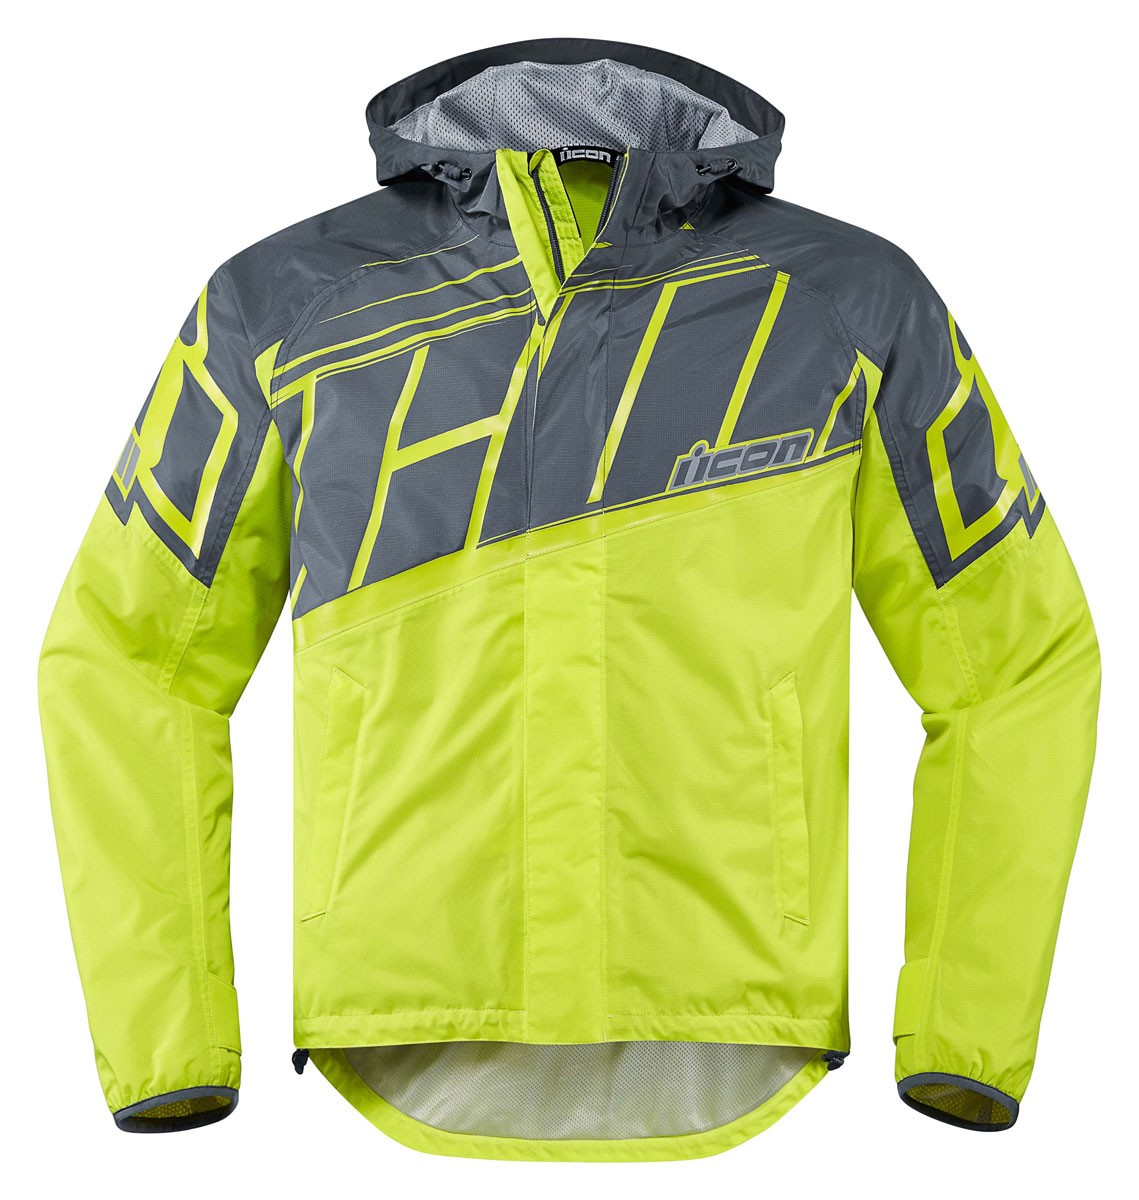 ICON PDX 2 Waterproof Nylon Motorcycle Rain Jacket (Hi-Viz)